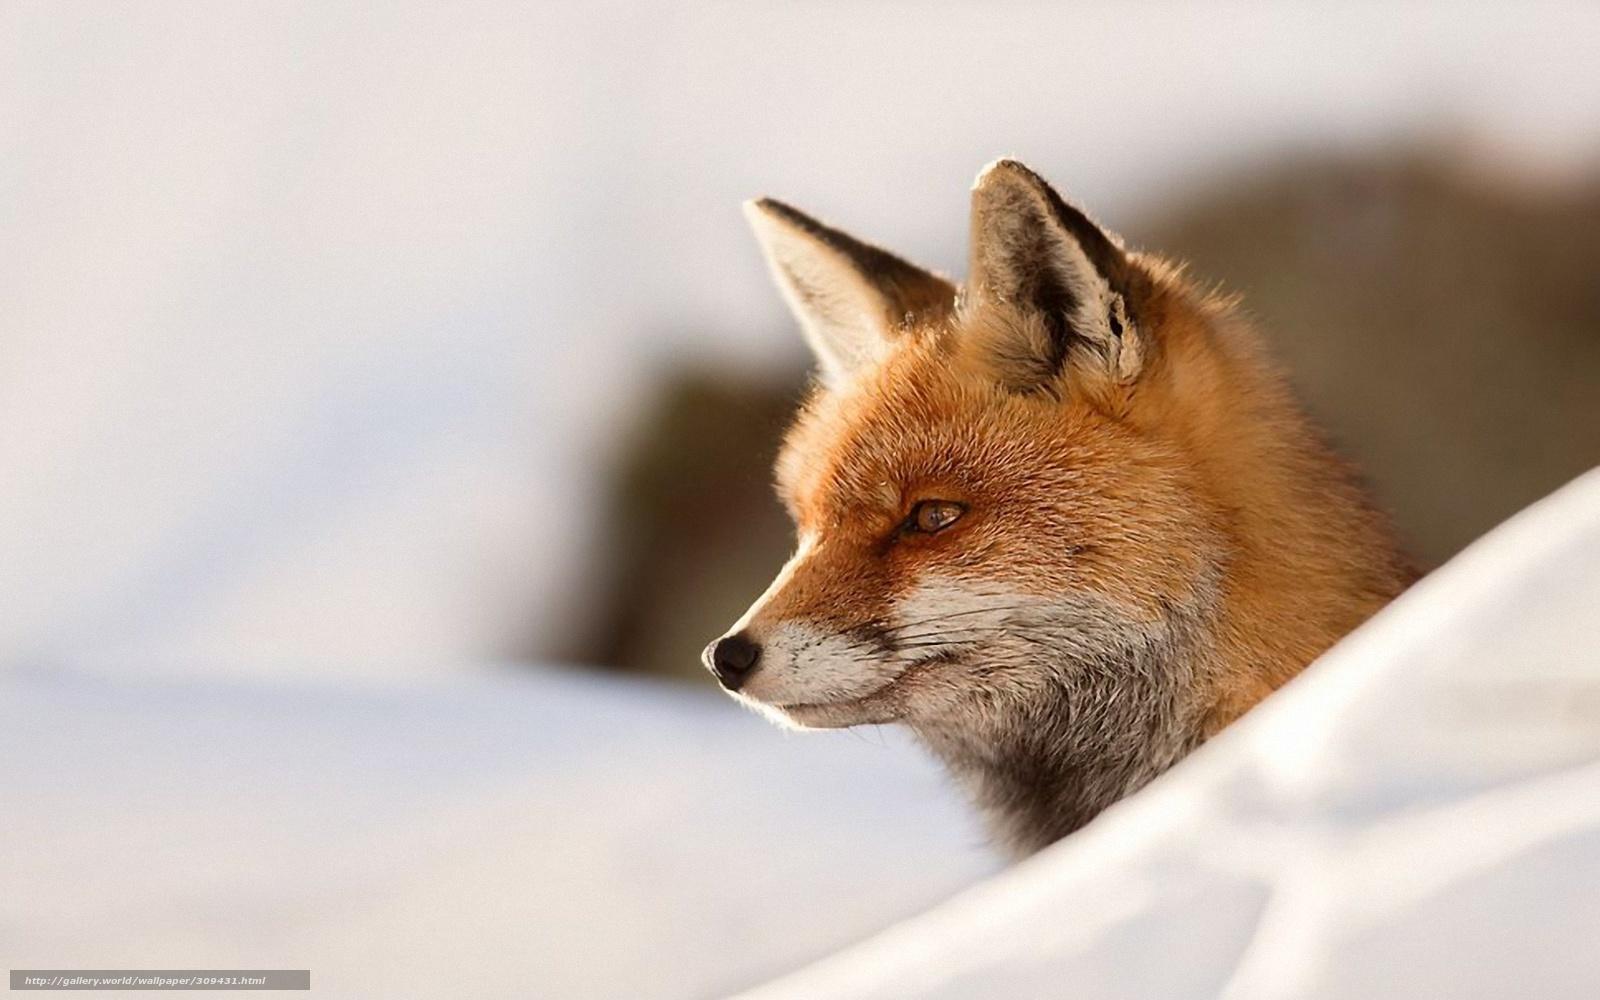 Tlcharger fond d 39 ecran renard hiver neige fonds d 39 ecran for Fond ecran hiver animaux